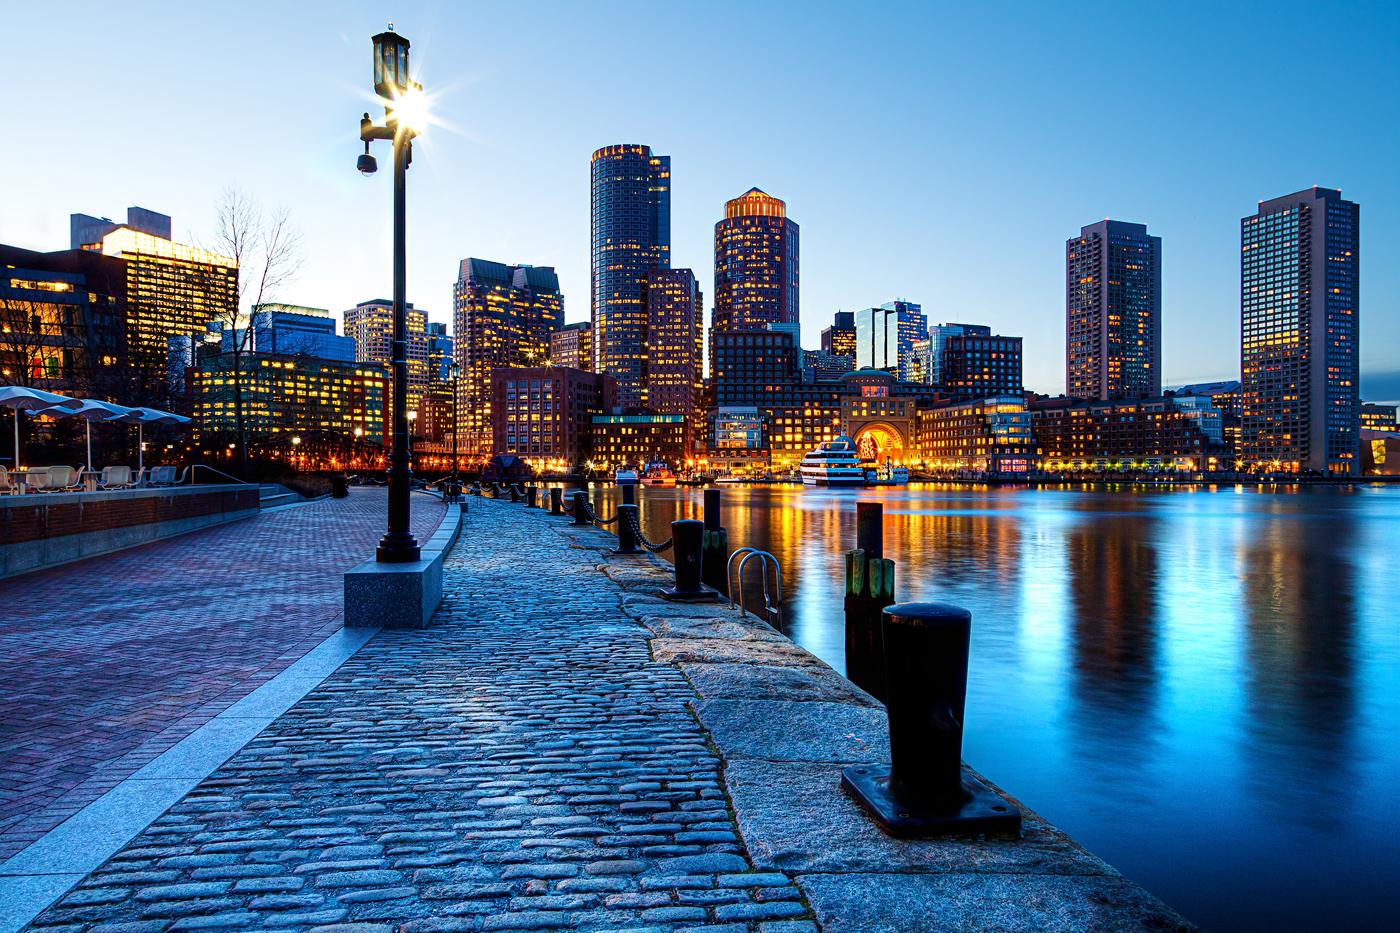 boston wallpaper photos 8592